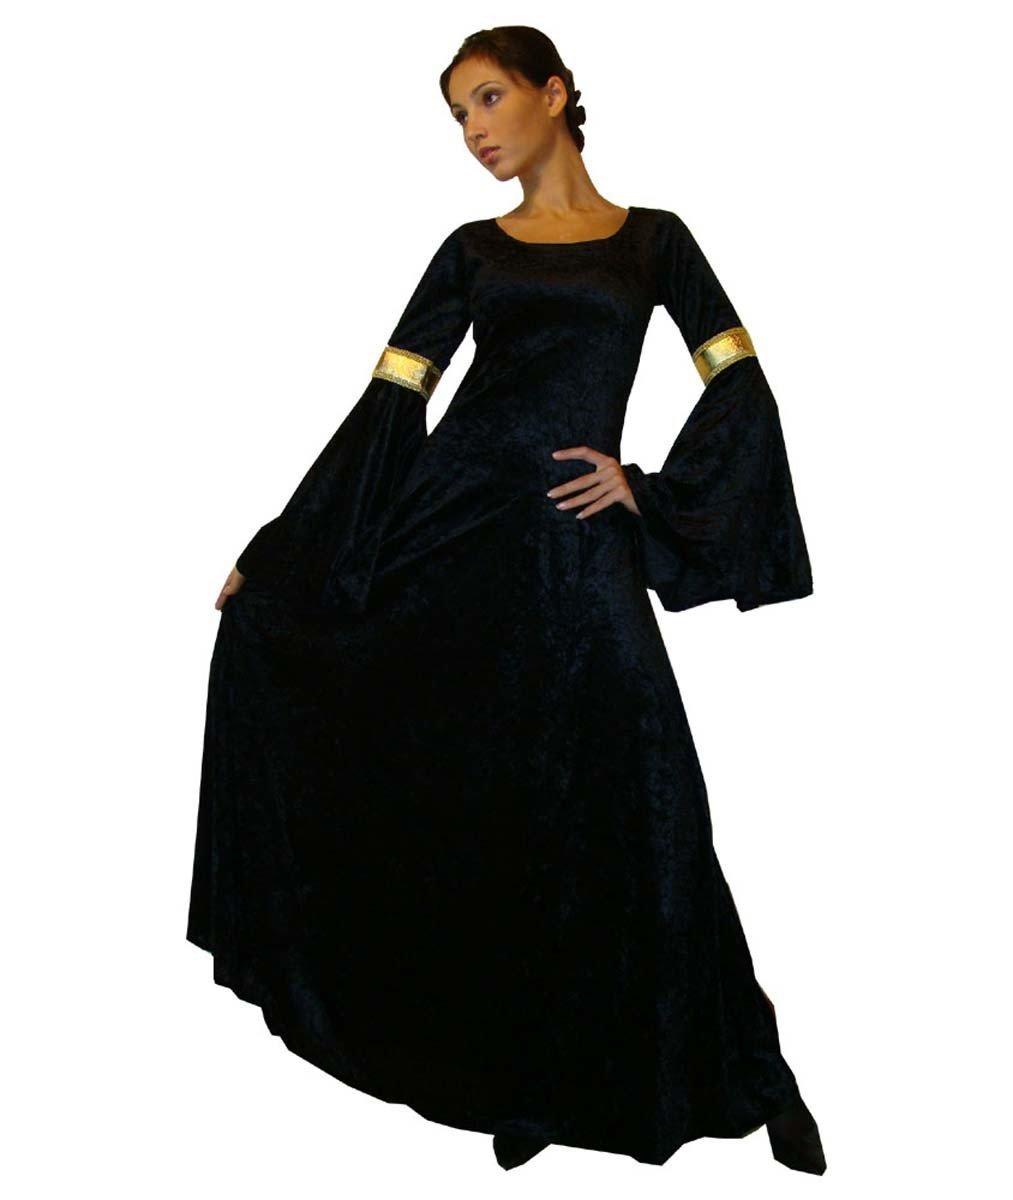 Maylynn - Disfraz de época para mujer, talla M (10923-M)